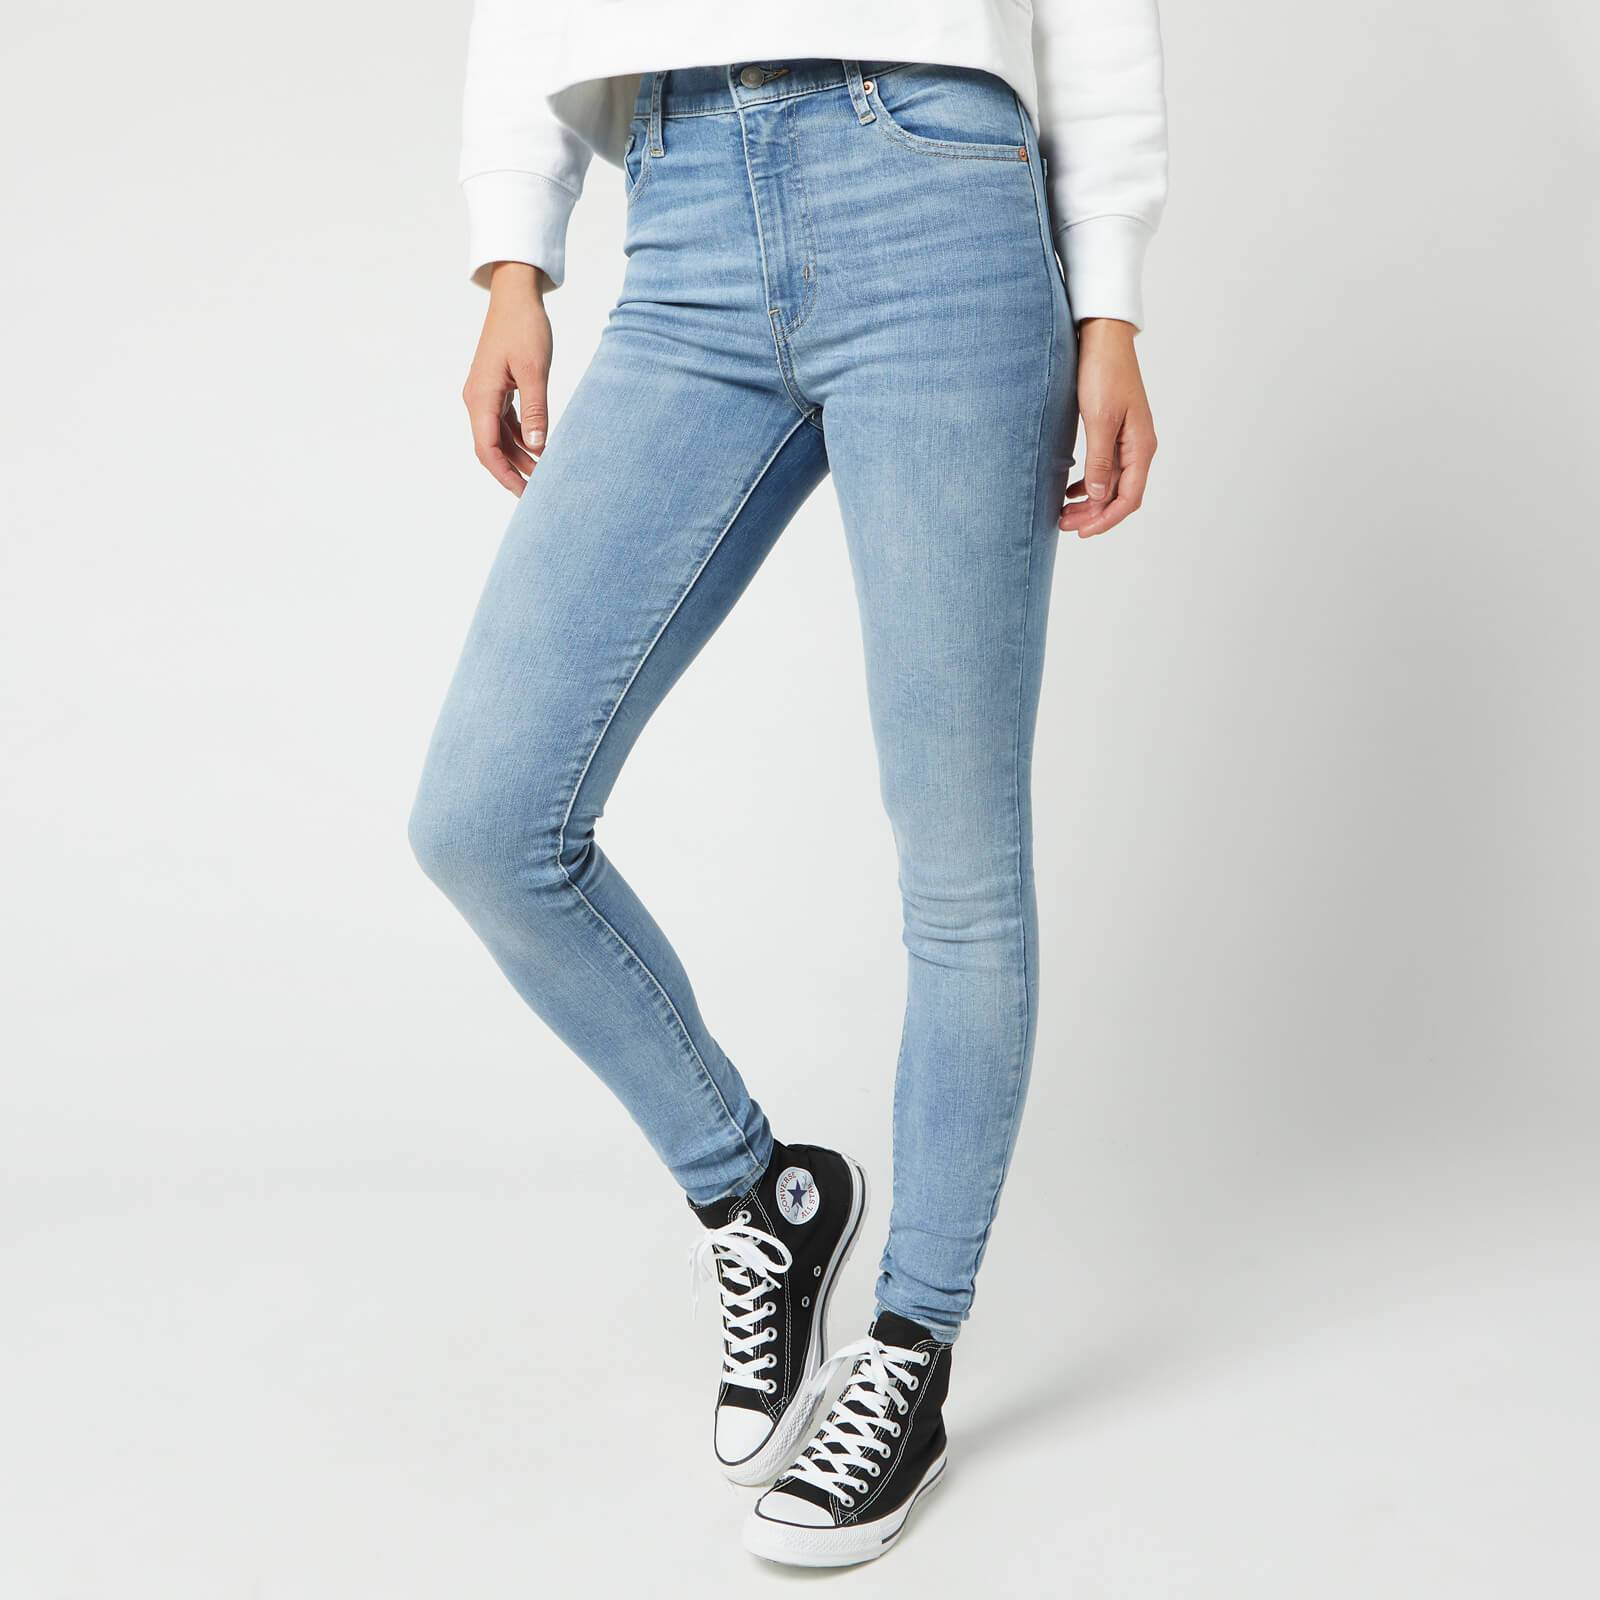 Levi's s Mile High Super Skinny Jeans - You Got Me - W29/L30